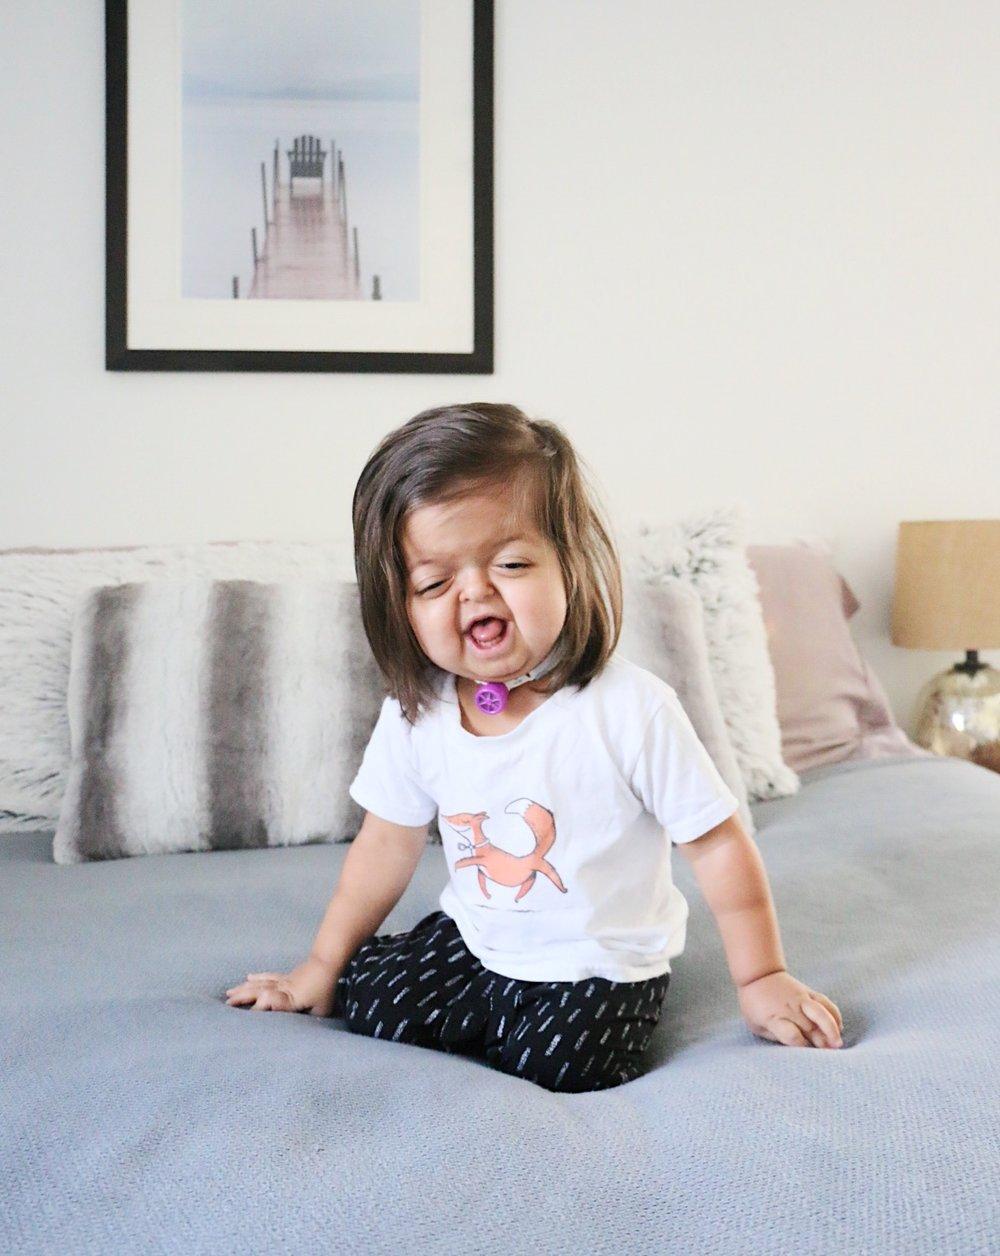 Trach t-shirt c/o Stoma Stoma